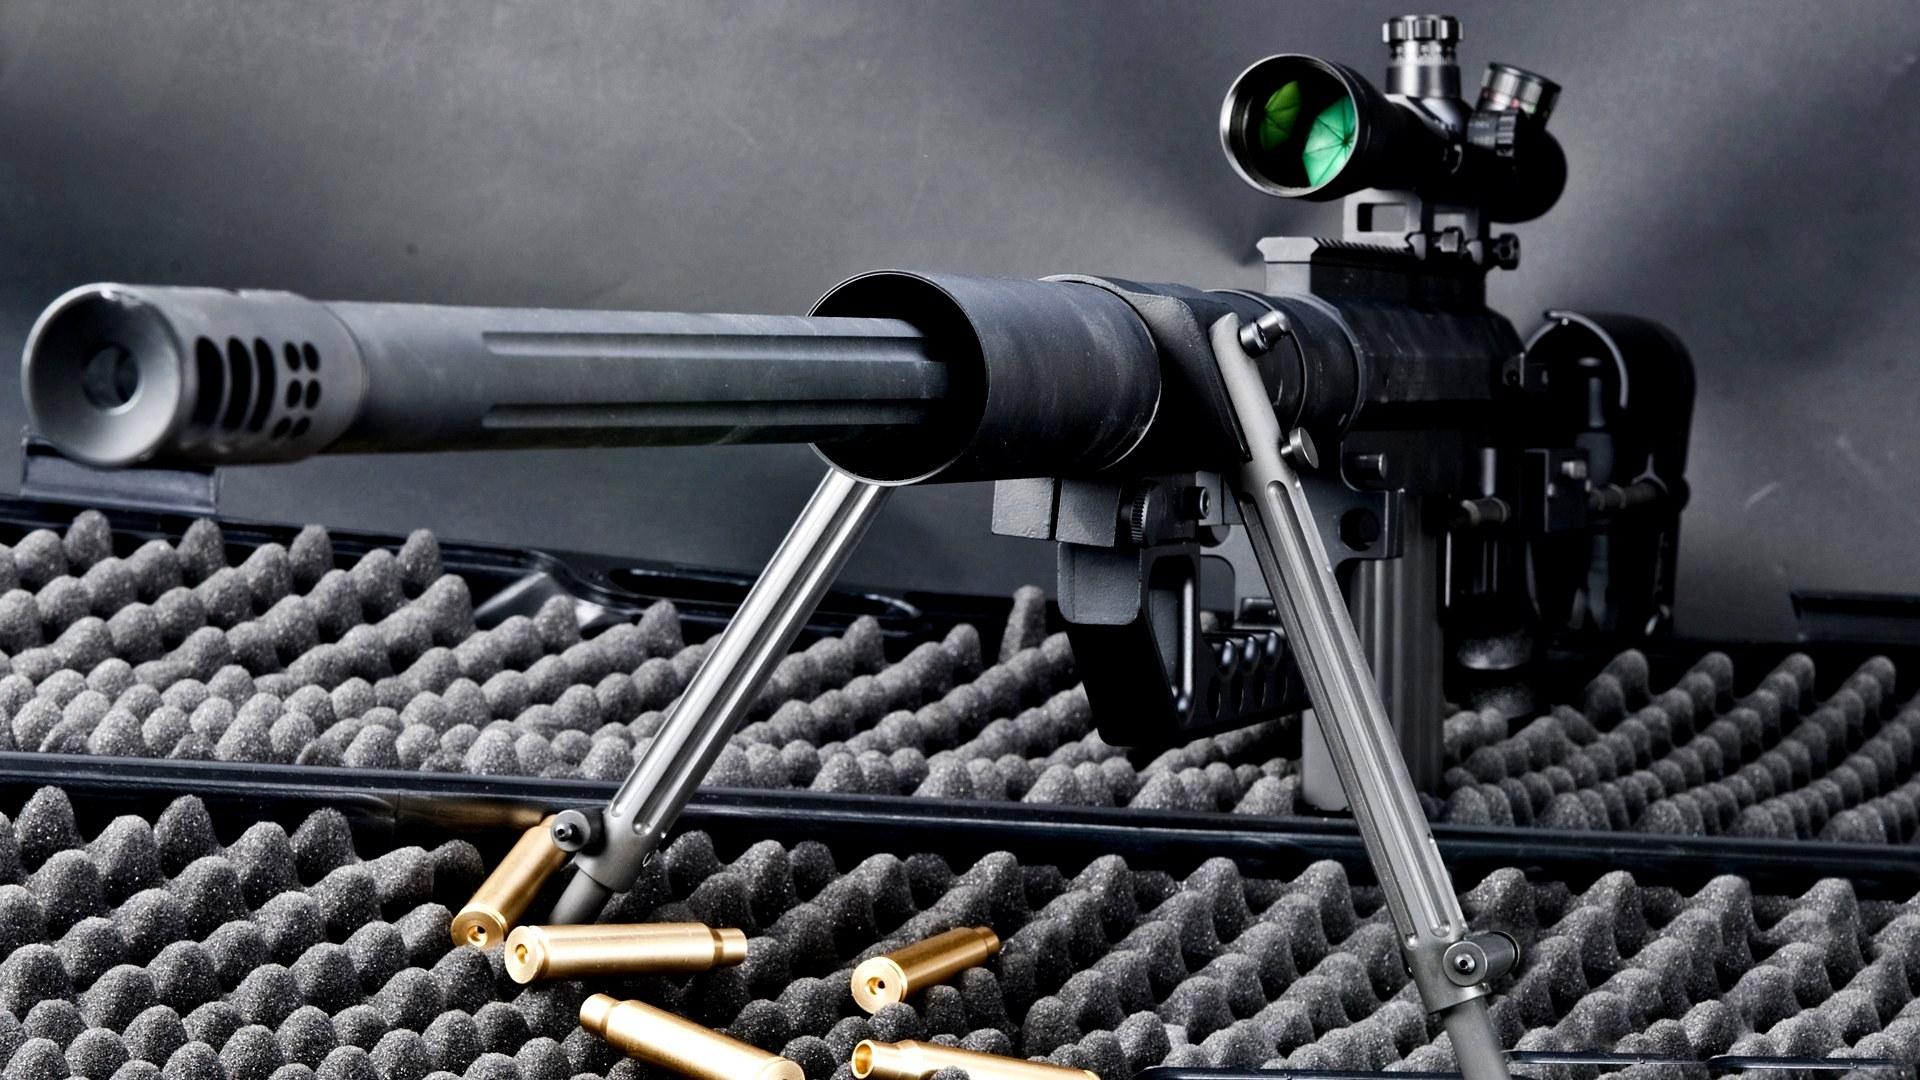 Sniper Rifle Wallpaper PNG Transparent best stock photos 1920x1080